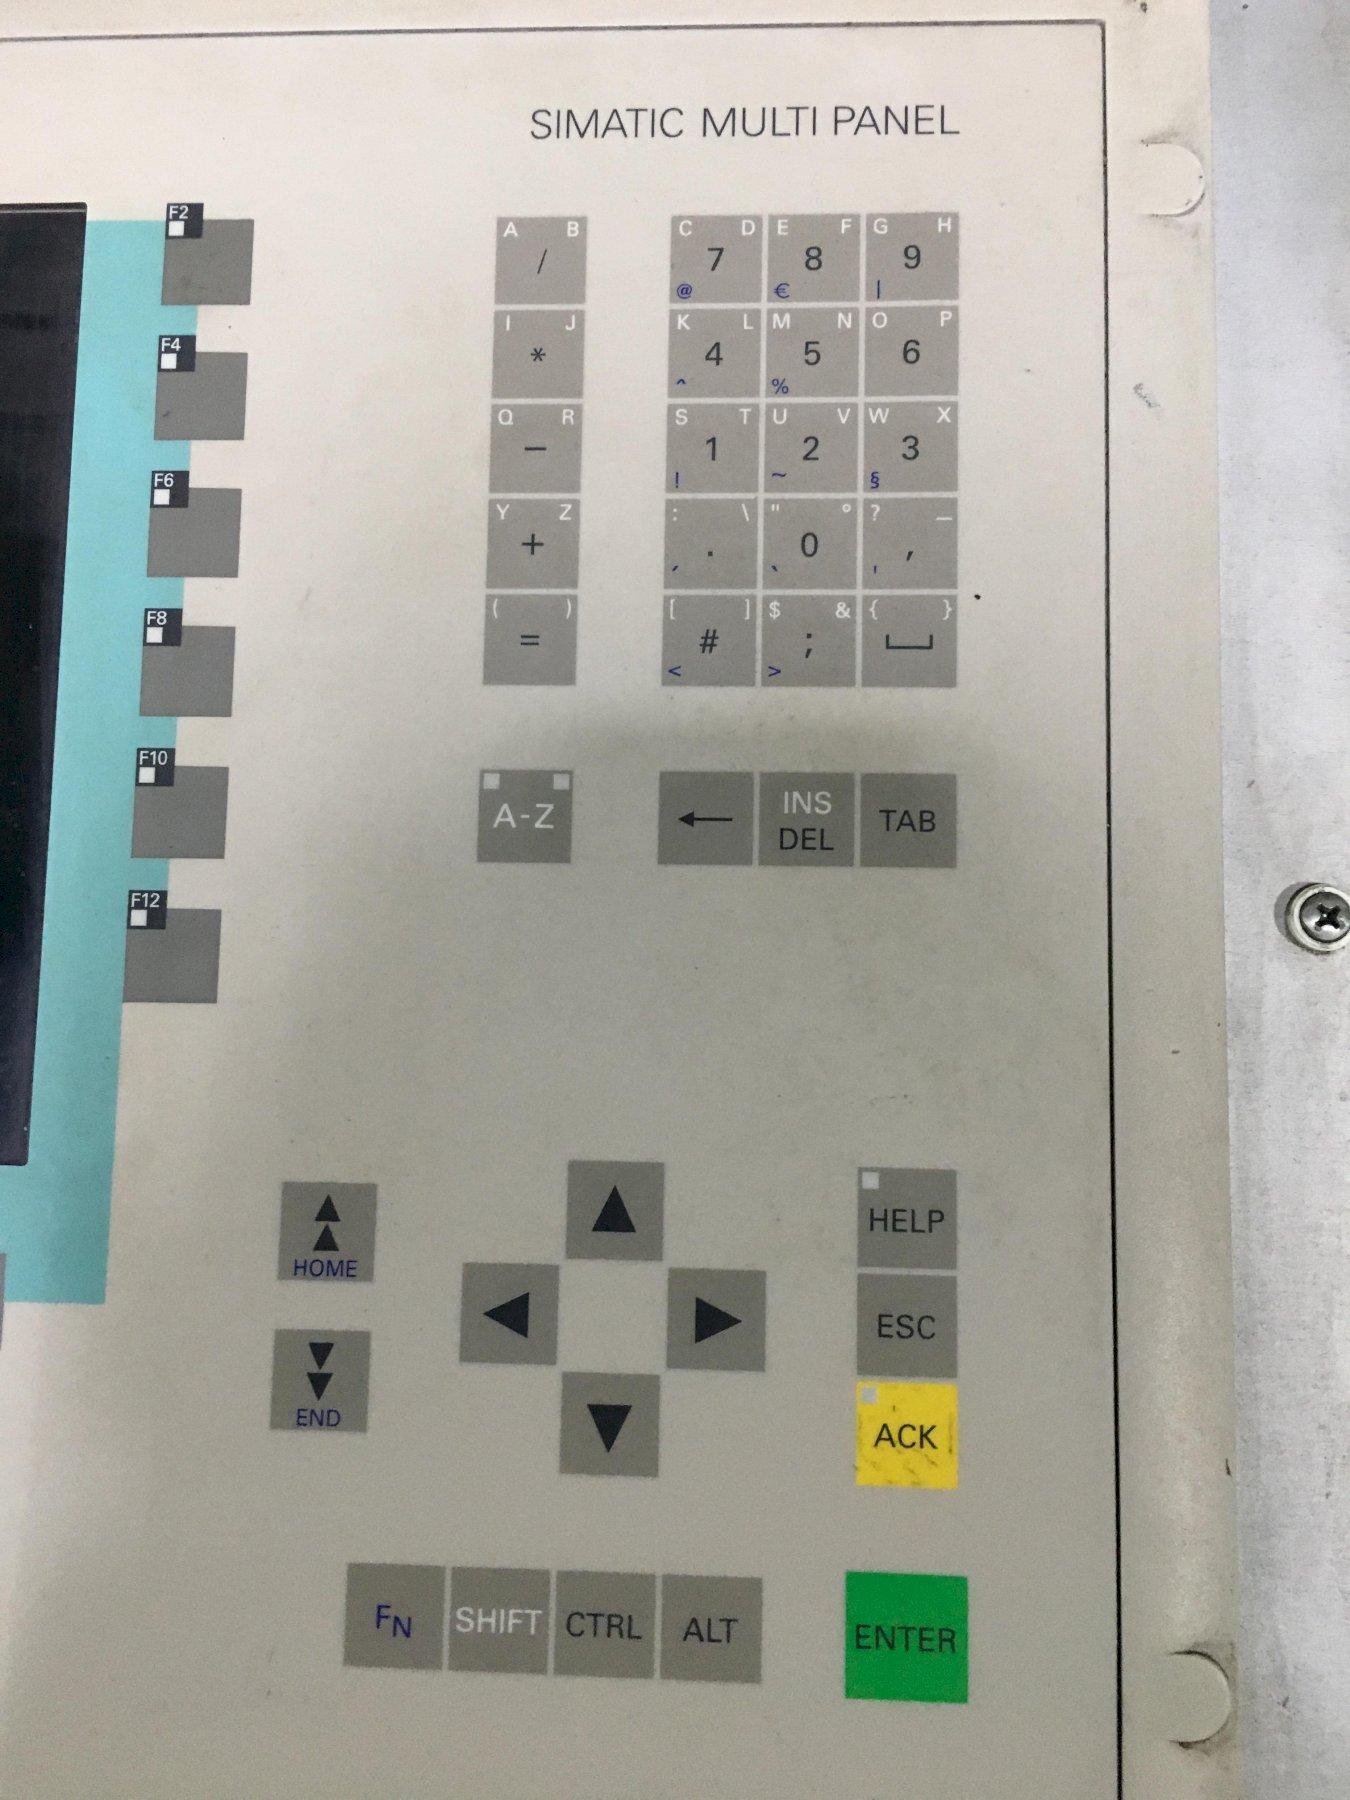 SIEMENS CONTROL 760 HMI MACHINE INTERFACE, Simatic Multipanel